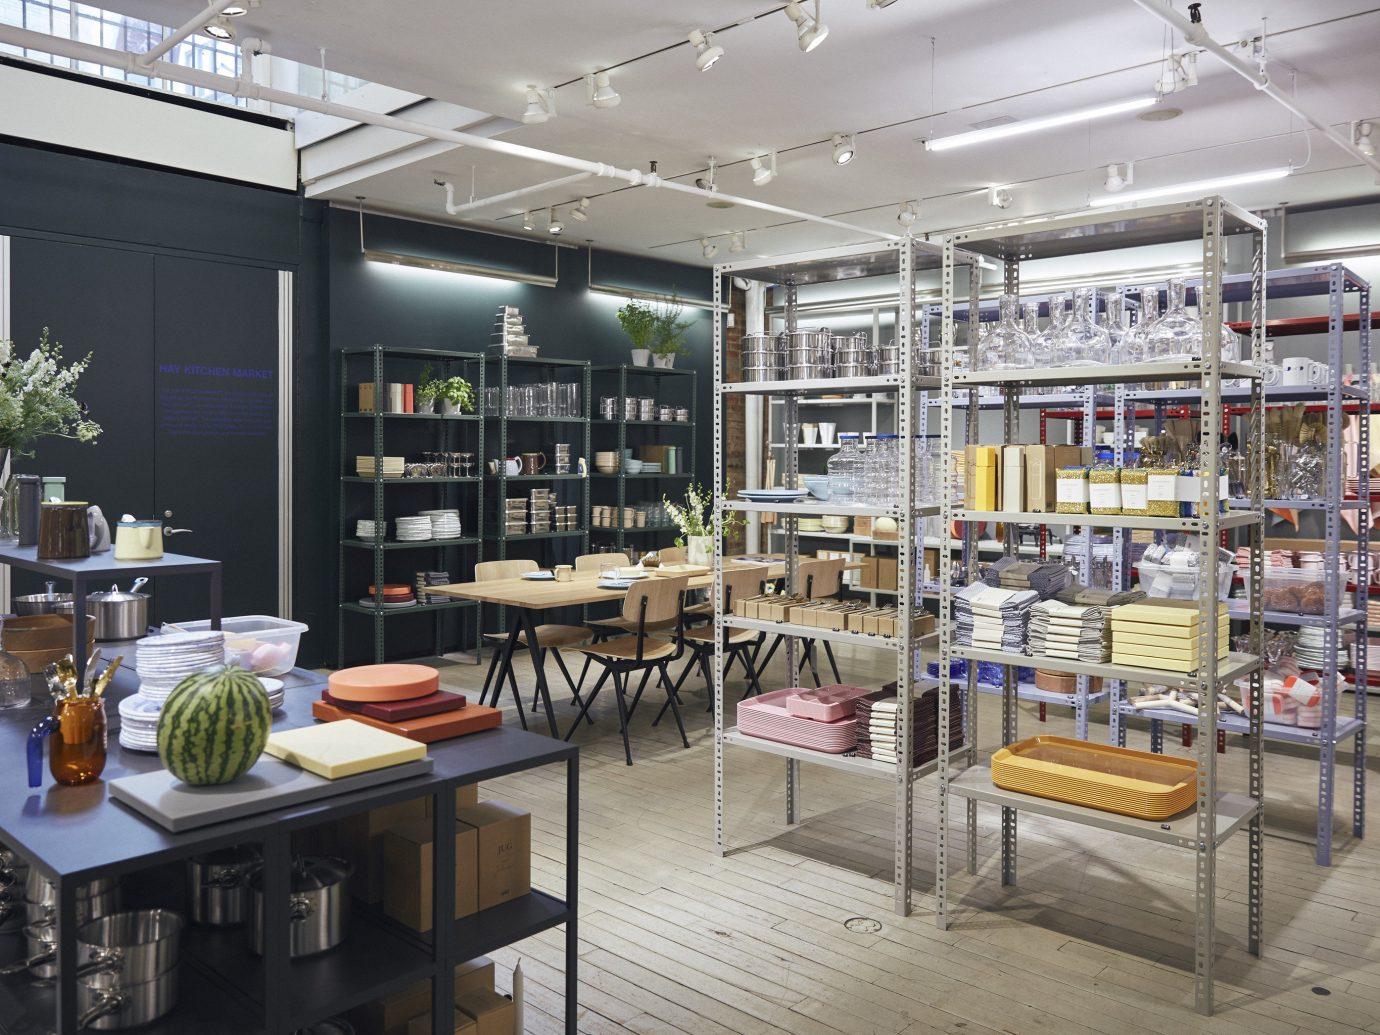 NYC Shops Style + Design indoor interior design retail café furniture